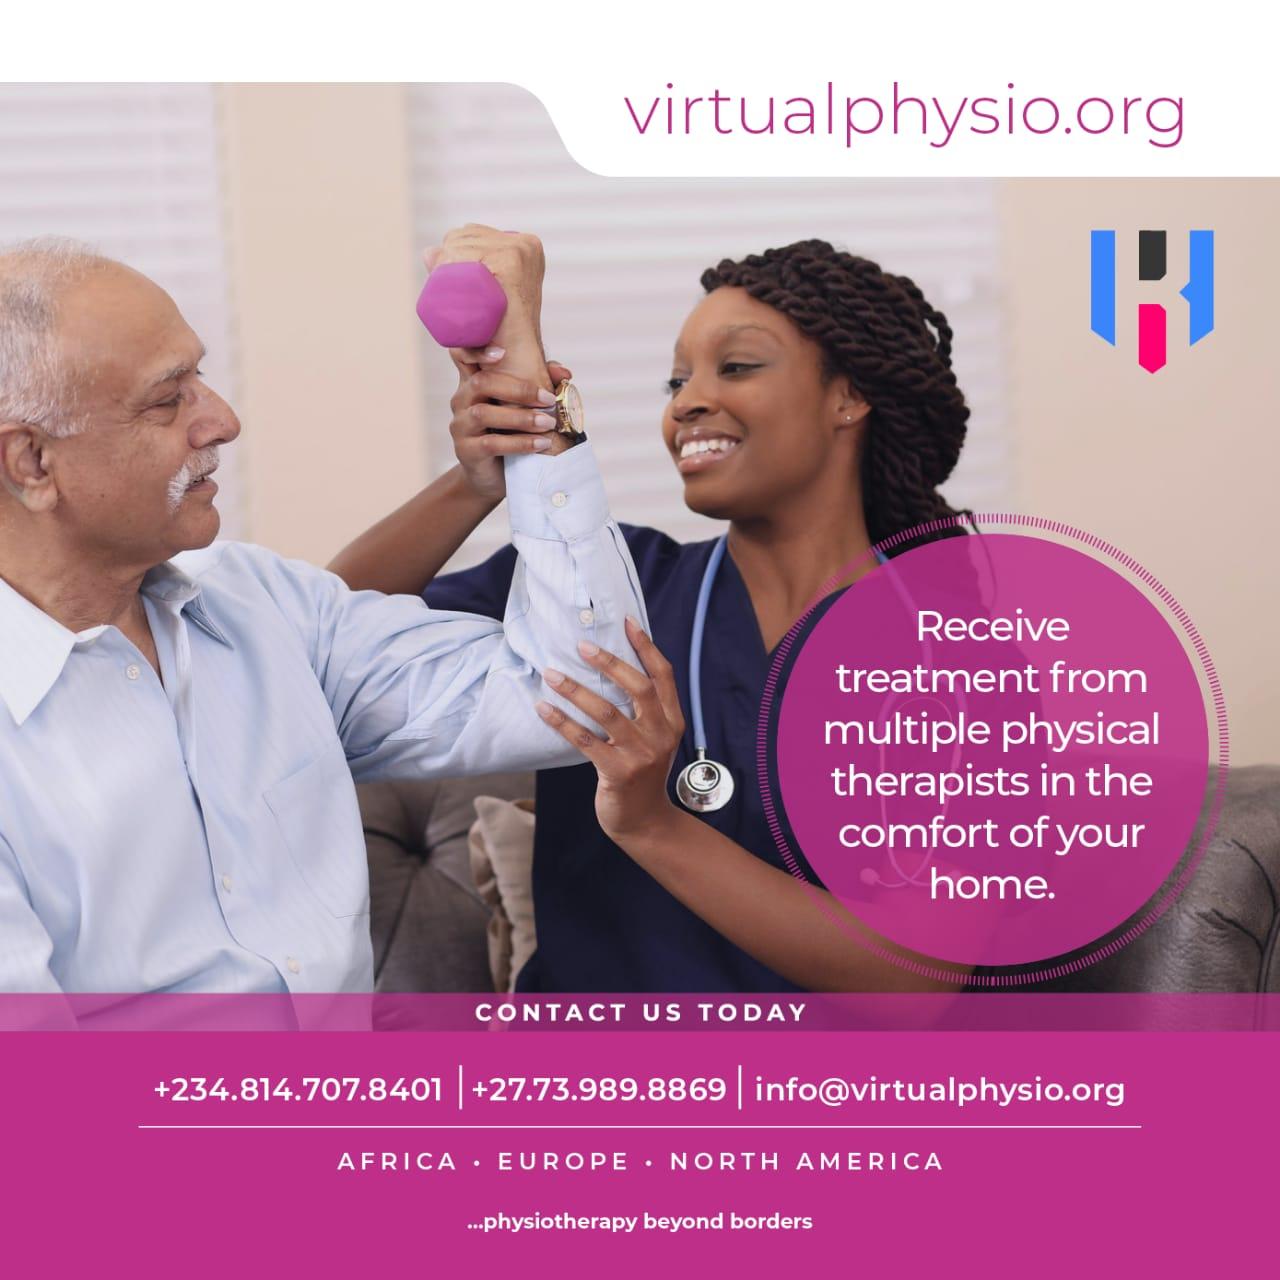 Virtual Physio